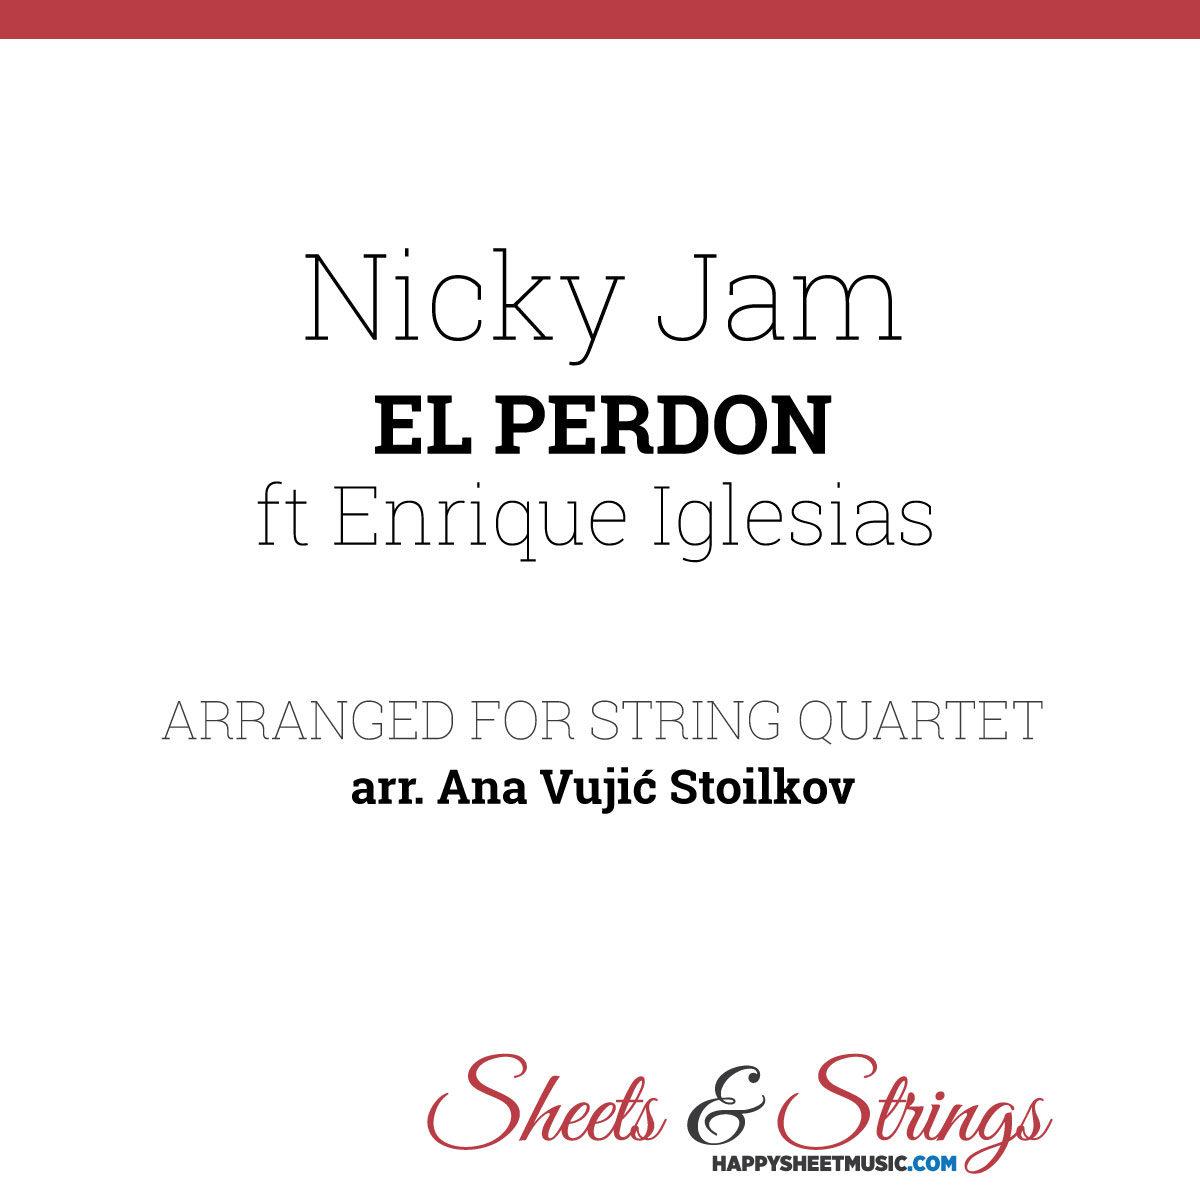 Nicky Jam ft Enrique Iglesias - El Perdon Sheet Music for String Quartet - Violin Sheet Music - Viola Sheet Muic - Cello Sheet Music